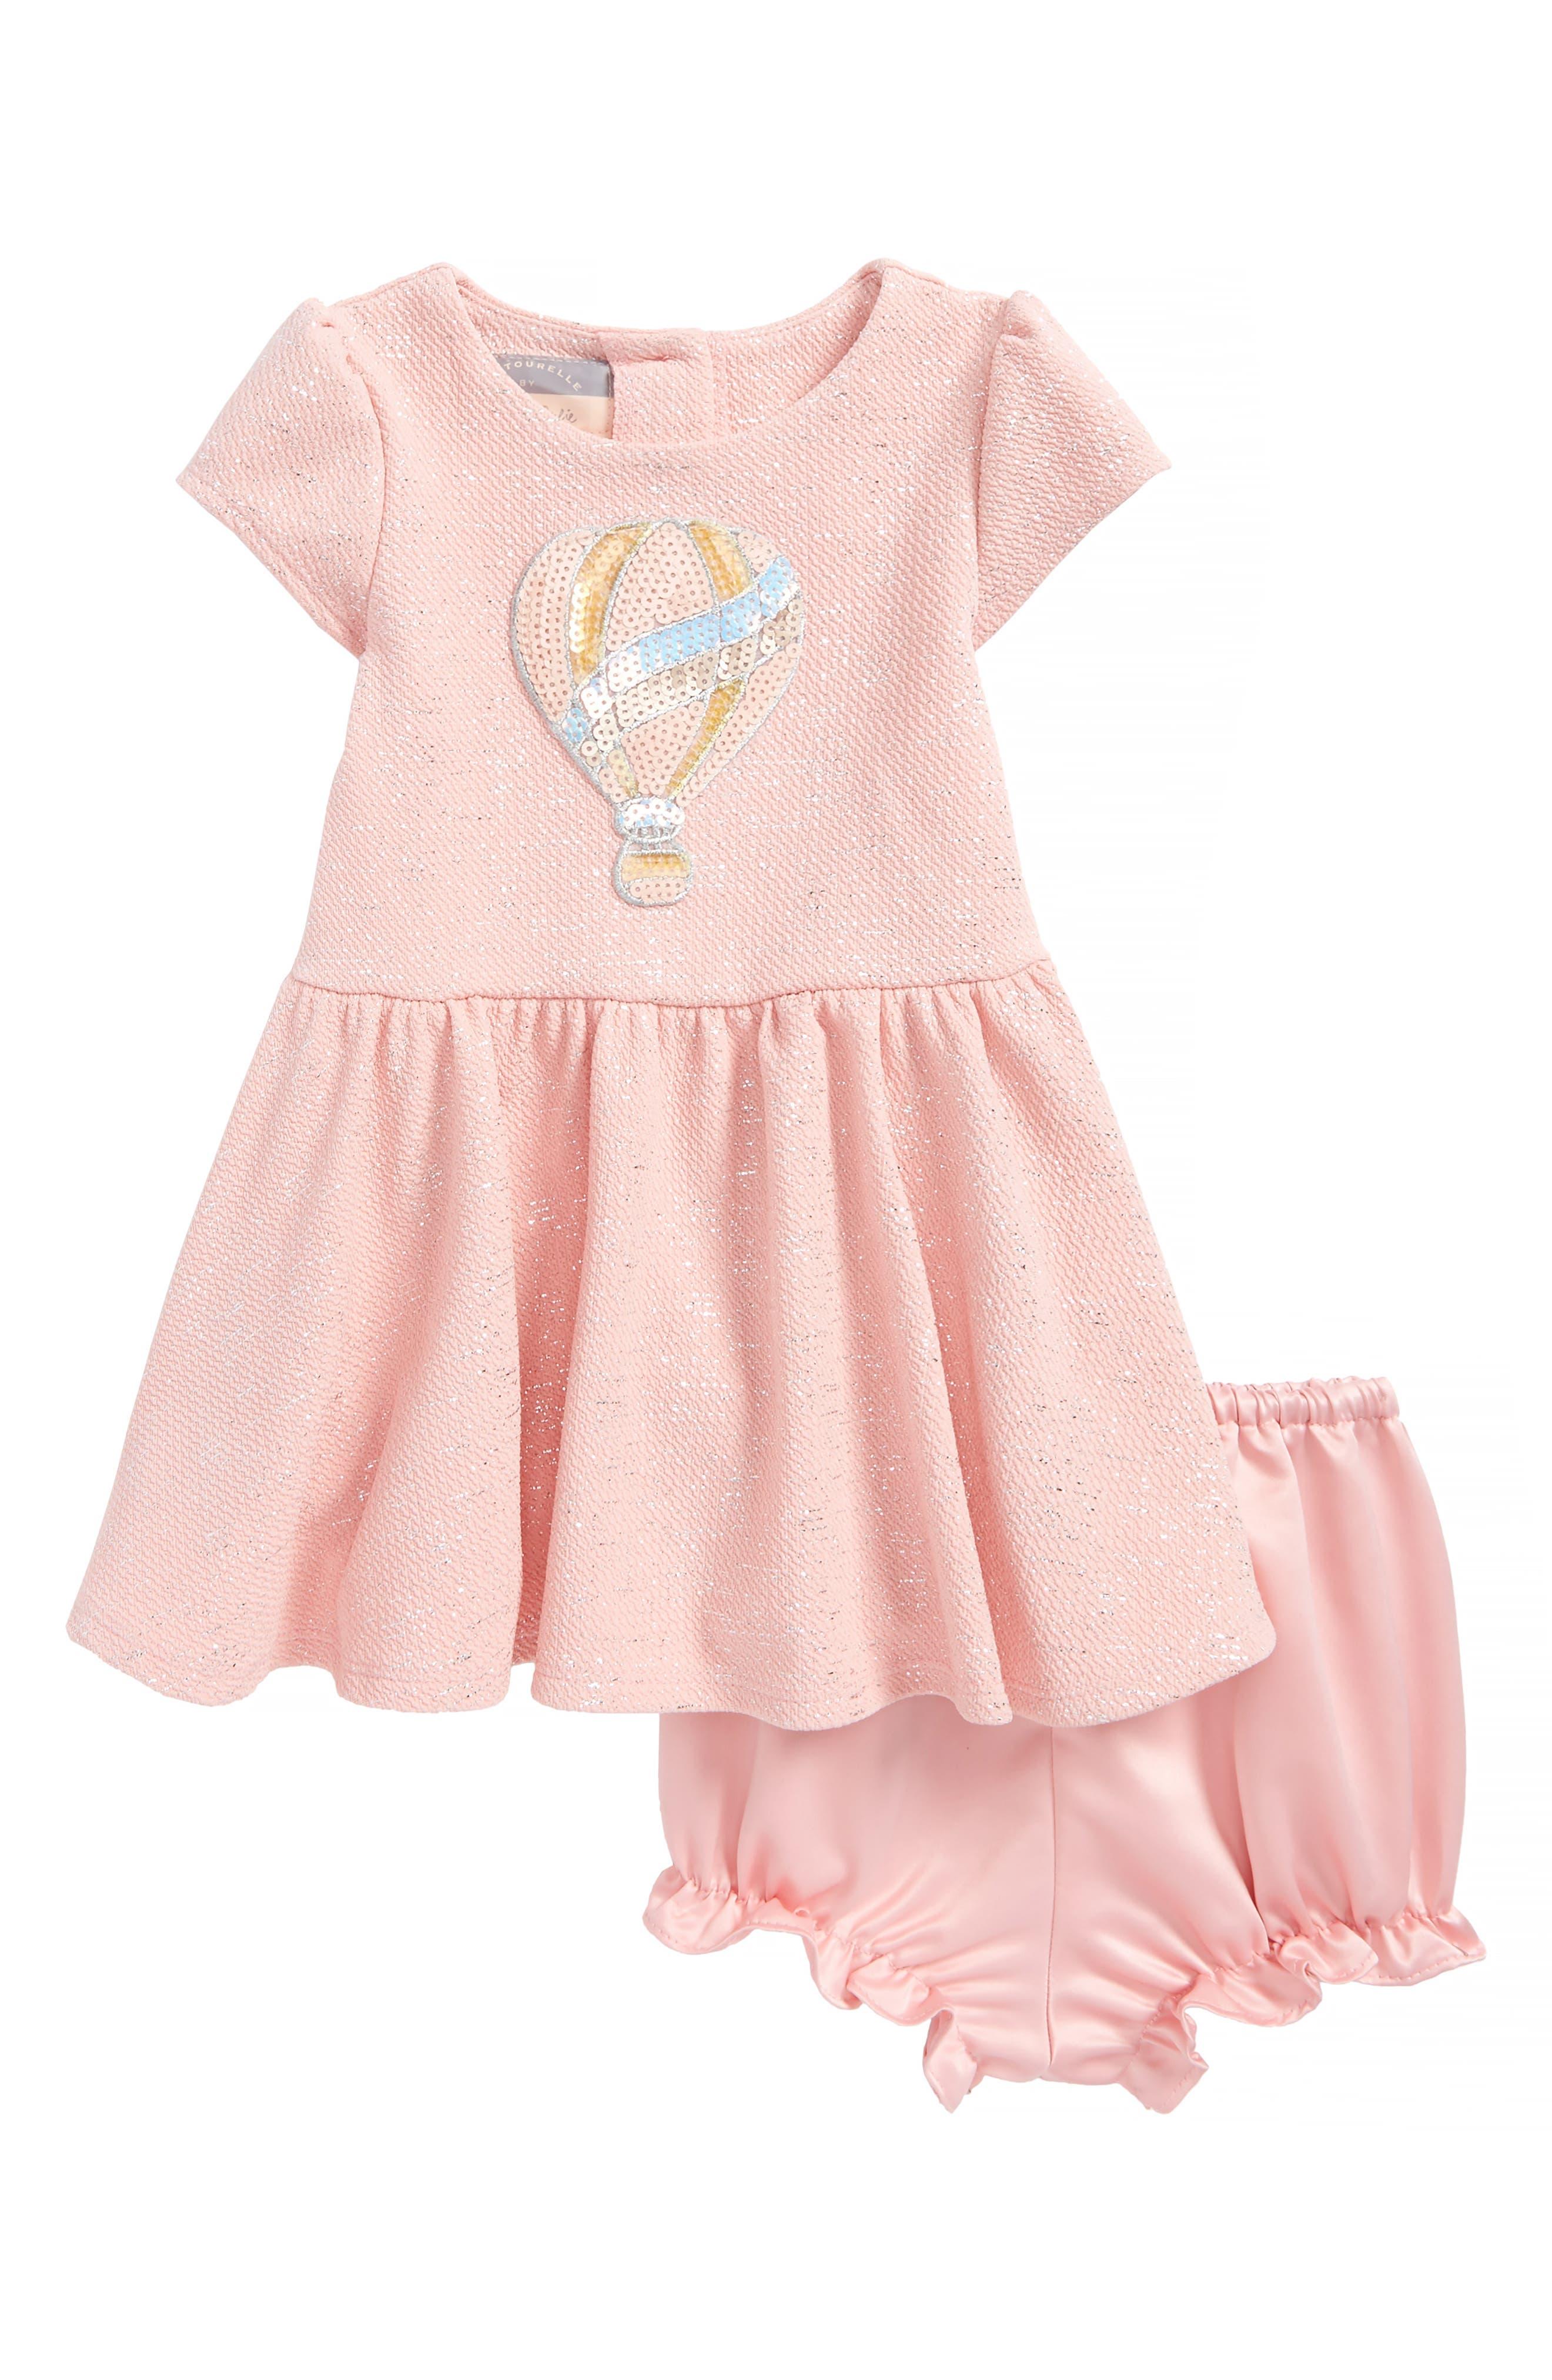 Sequin Balloon Skater Dress,                         Main,                         color, Pink